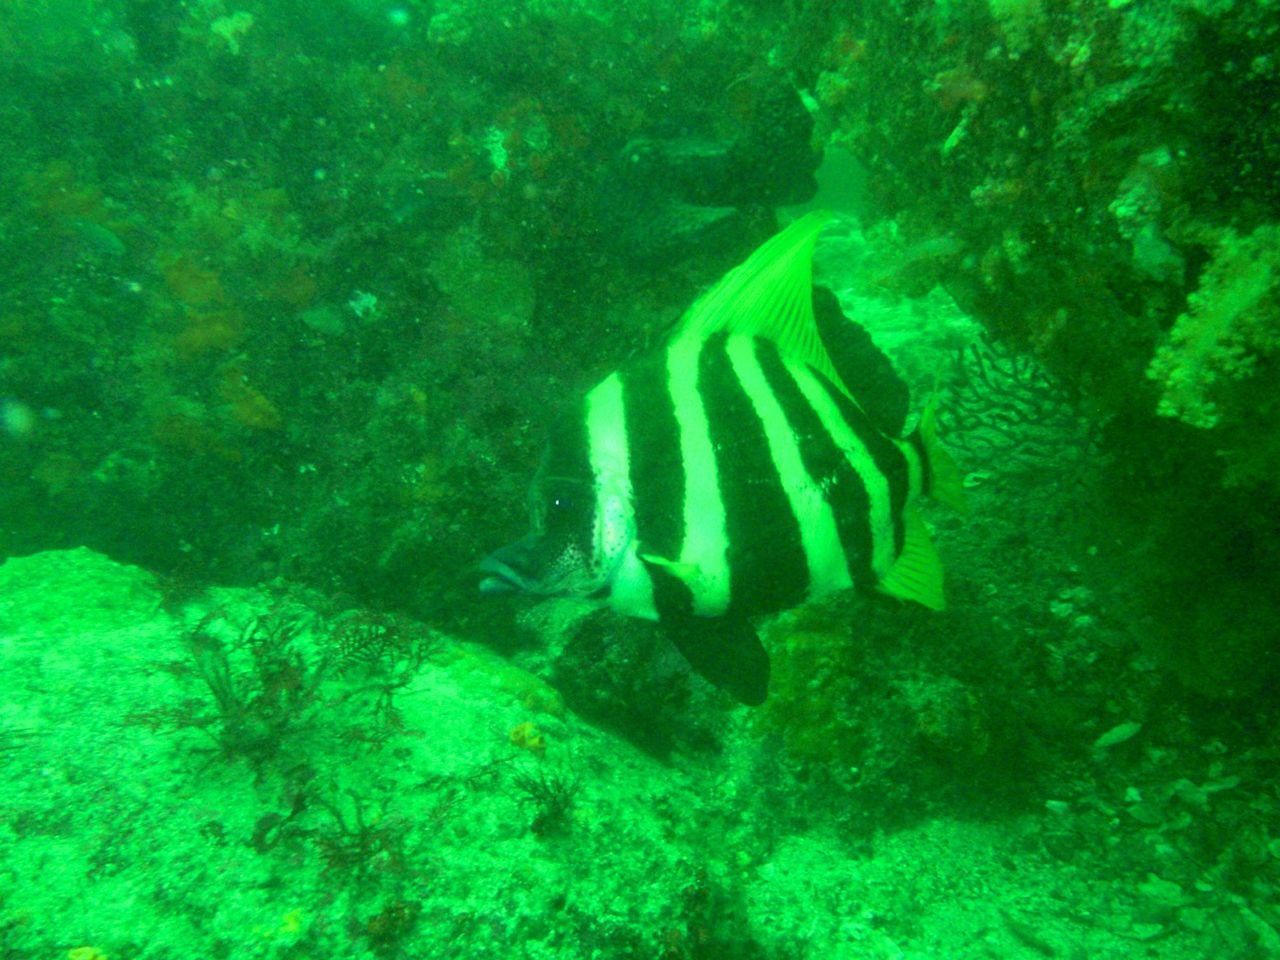 http://www.aquamarine-dive.net/blog/index.html/2014/06/15/P6153234_1.jpg